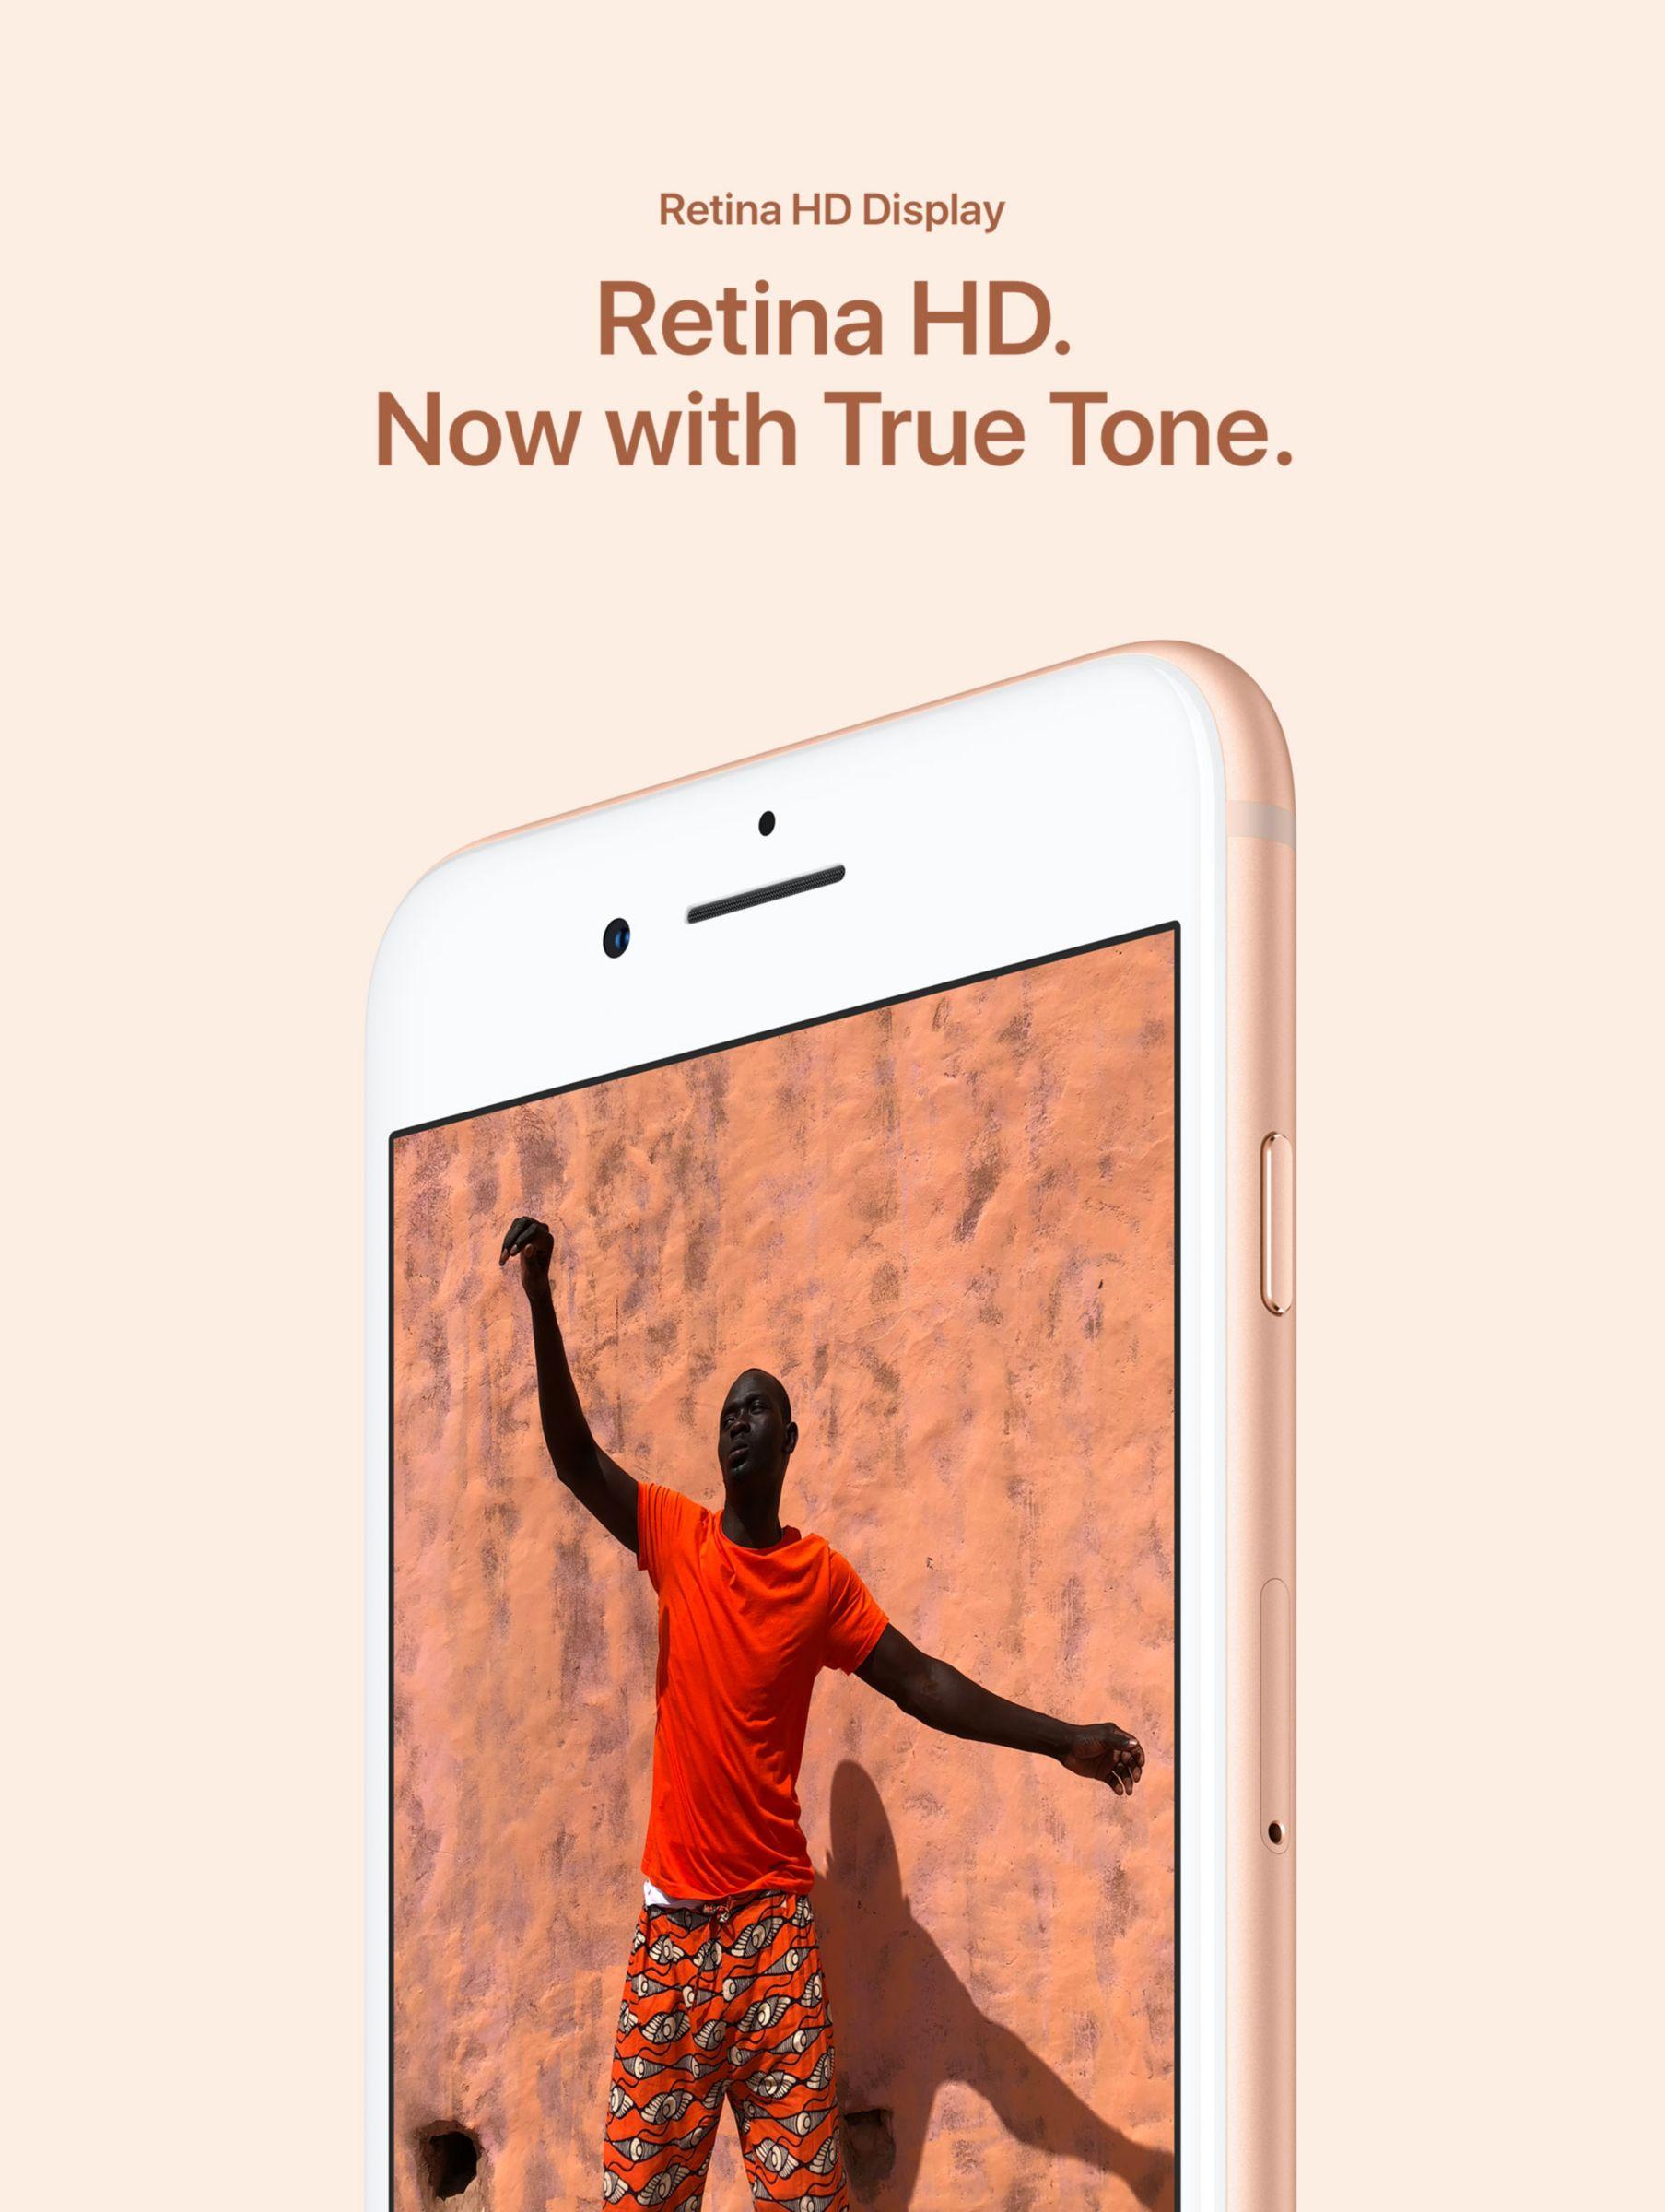 Retina HD Display - Retina HD. Now with True Tone.